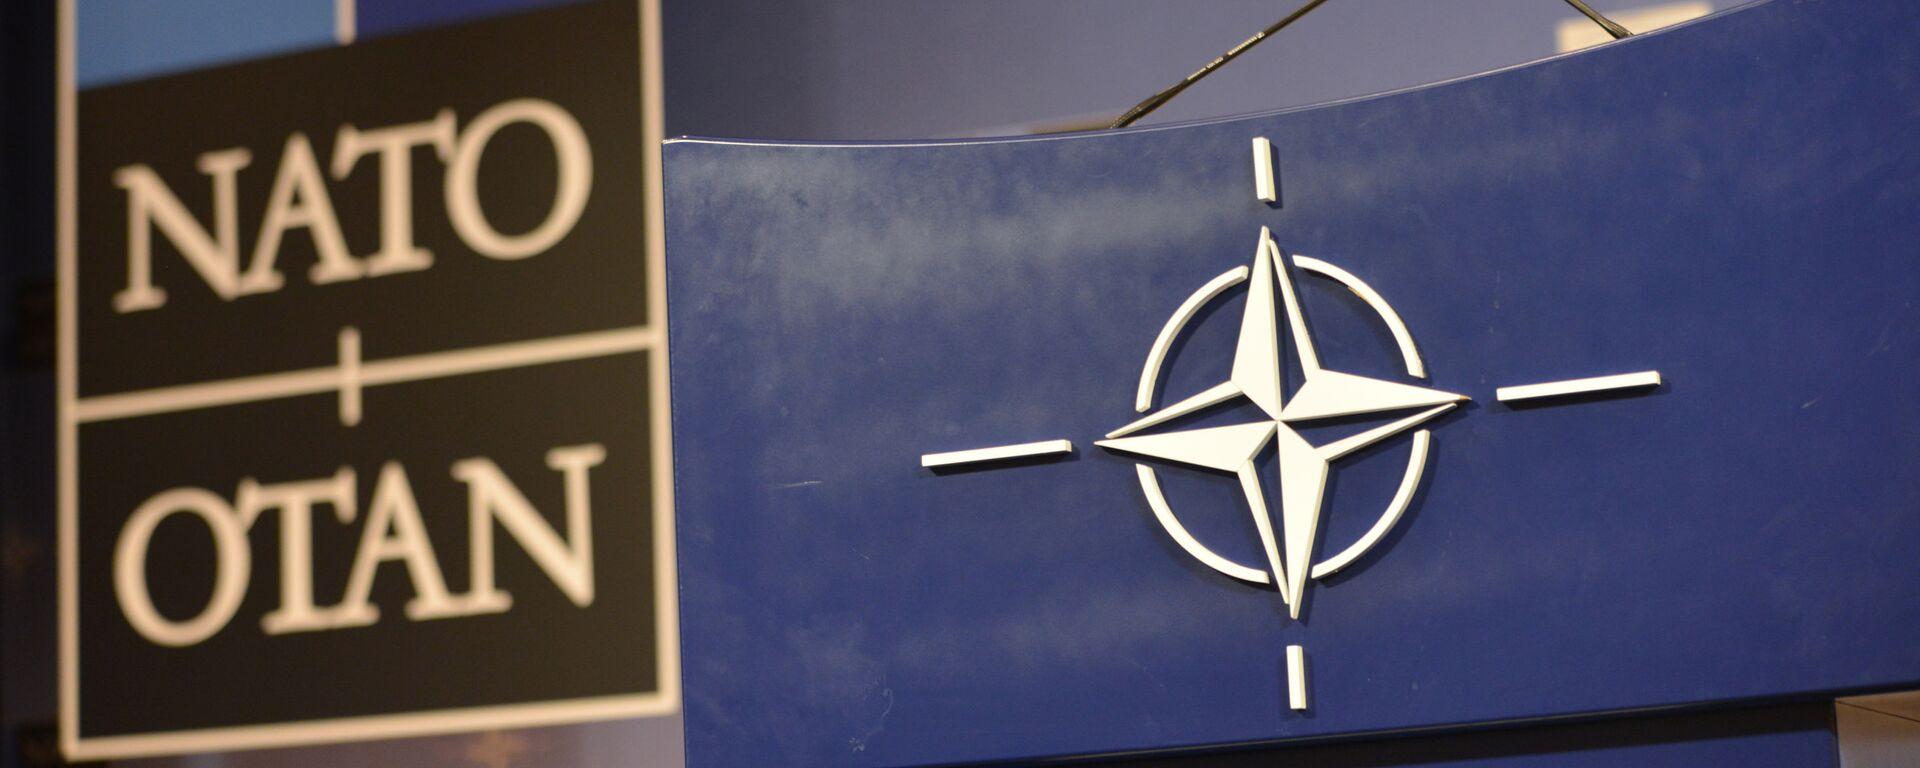 Трибуна в зале для пресс-конференций штаб-квартиры НАТО. - Sputnik Азербайджан, 1920, 18.08.2021